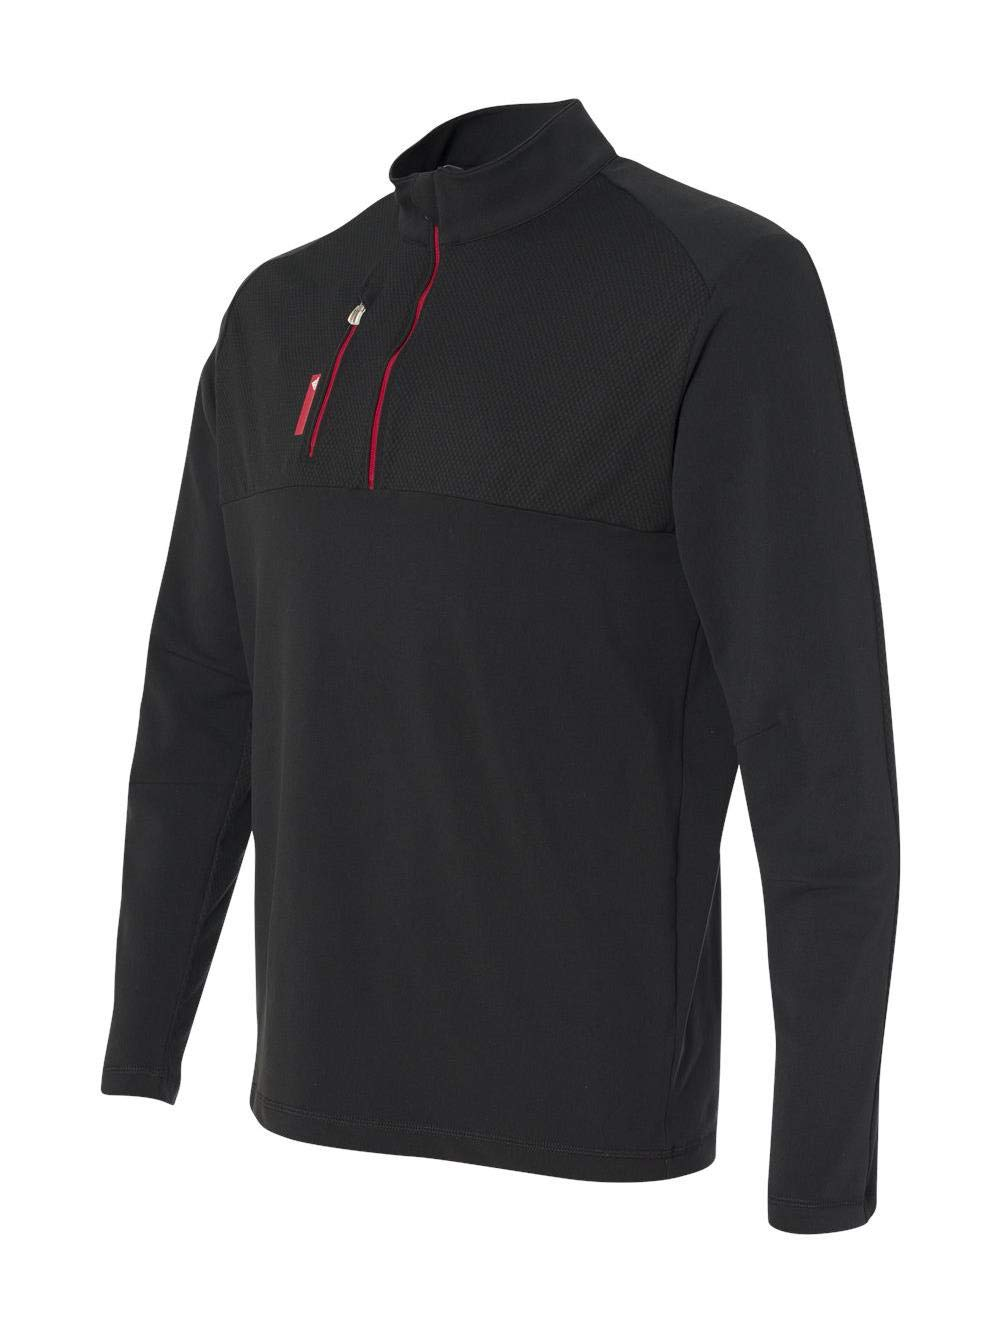 adidas Golf Mens Puremotion Mixed Media Quarter-Zip (A195) -Black/Bold -M